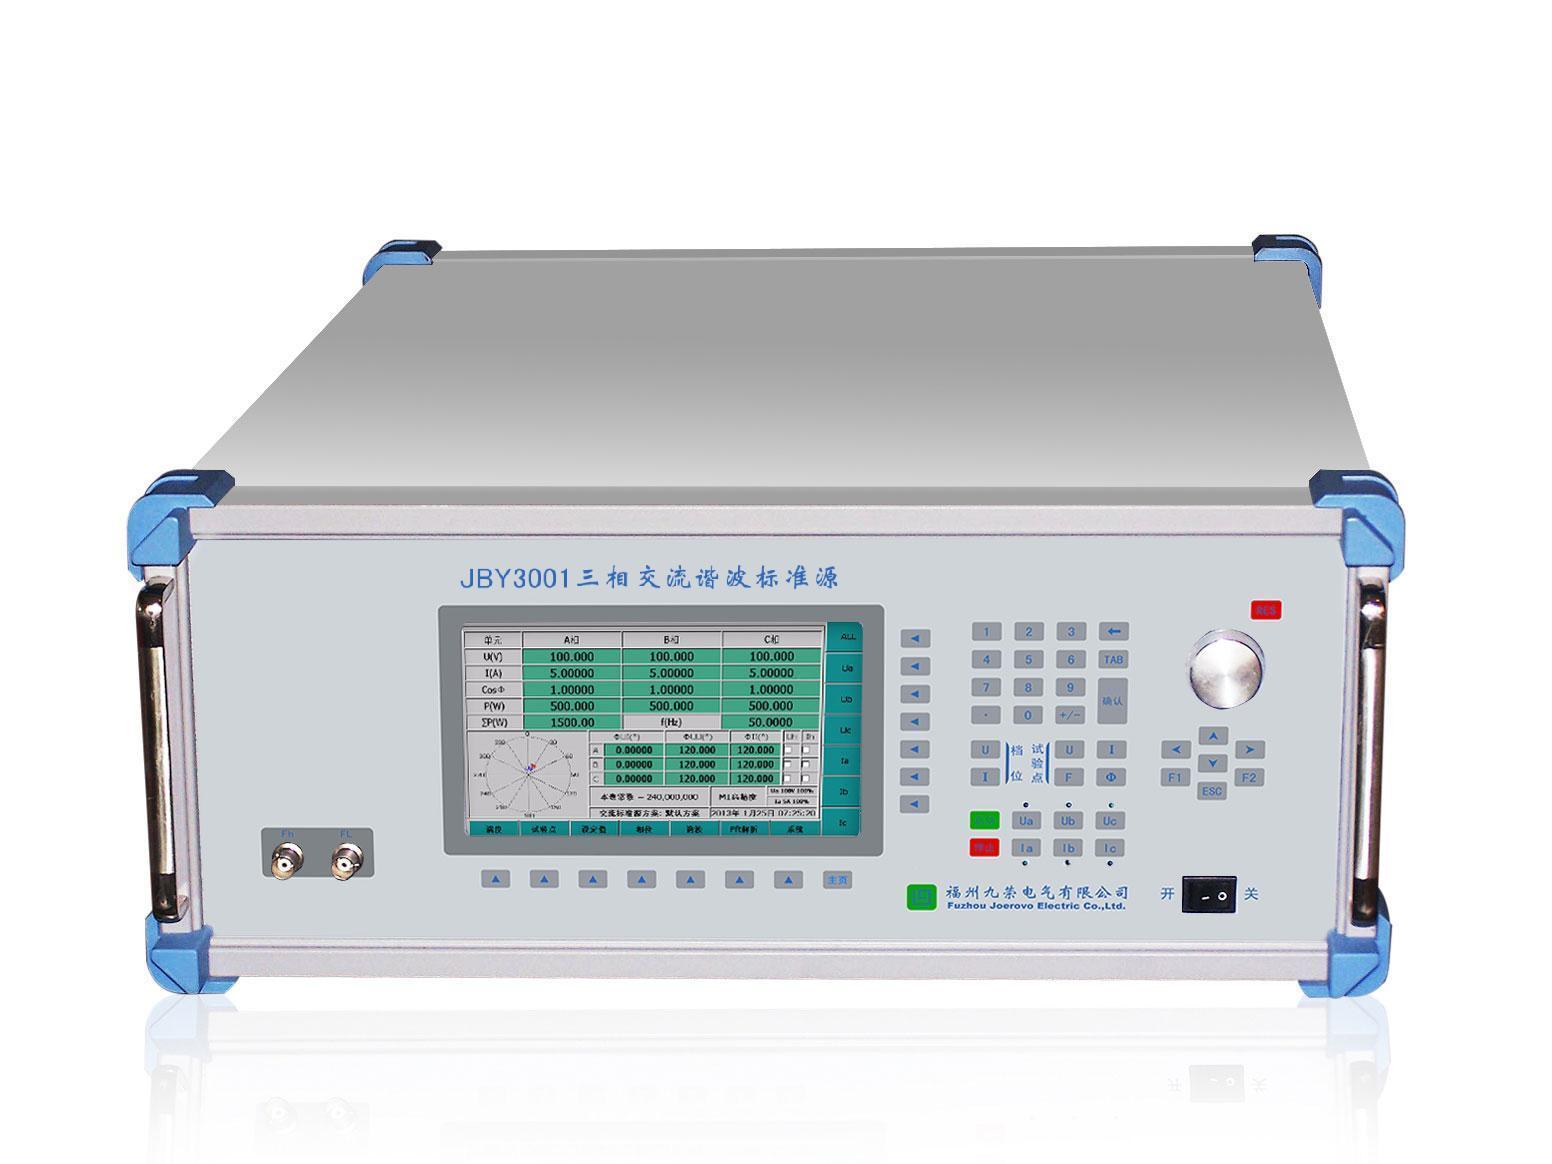 JBY3001 三相交流谐波标准源